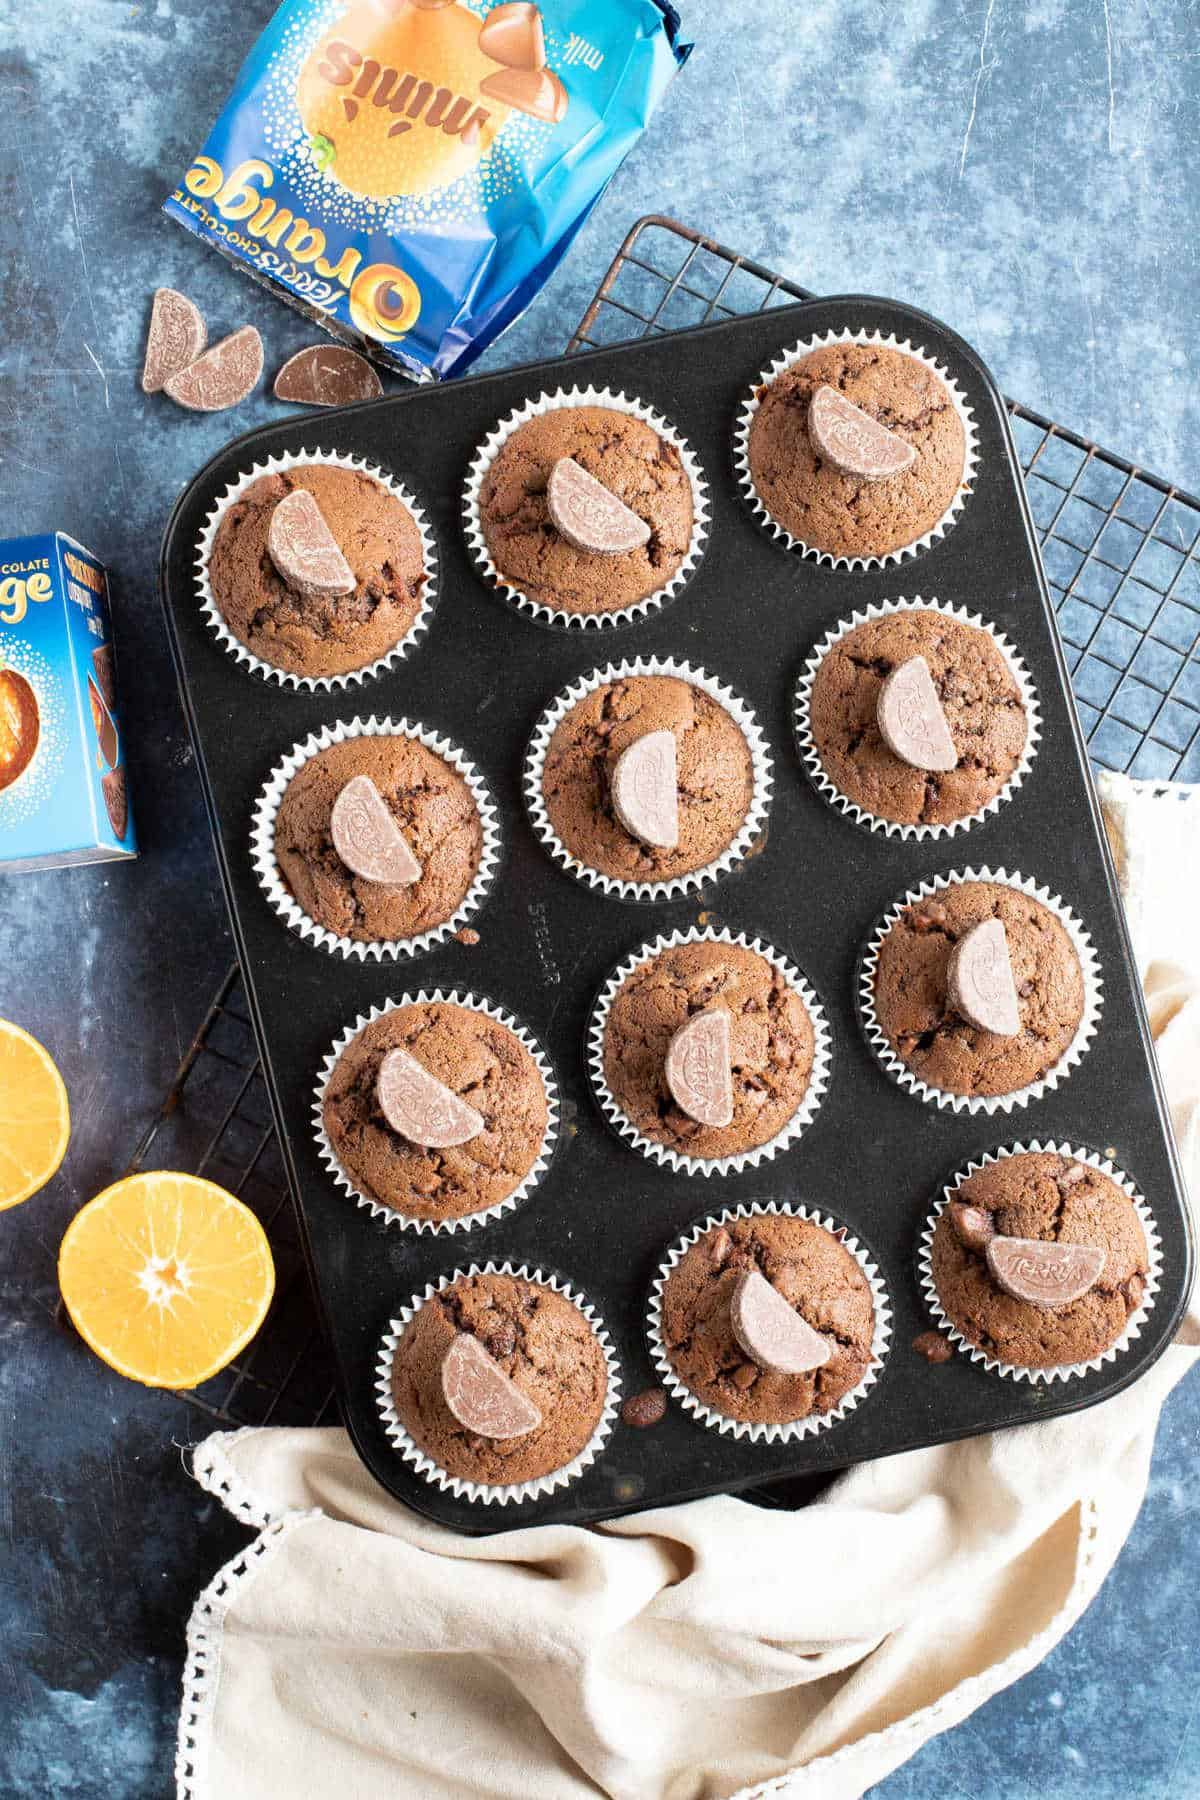 Chocolate orange muffins in a baking tin.